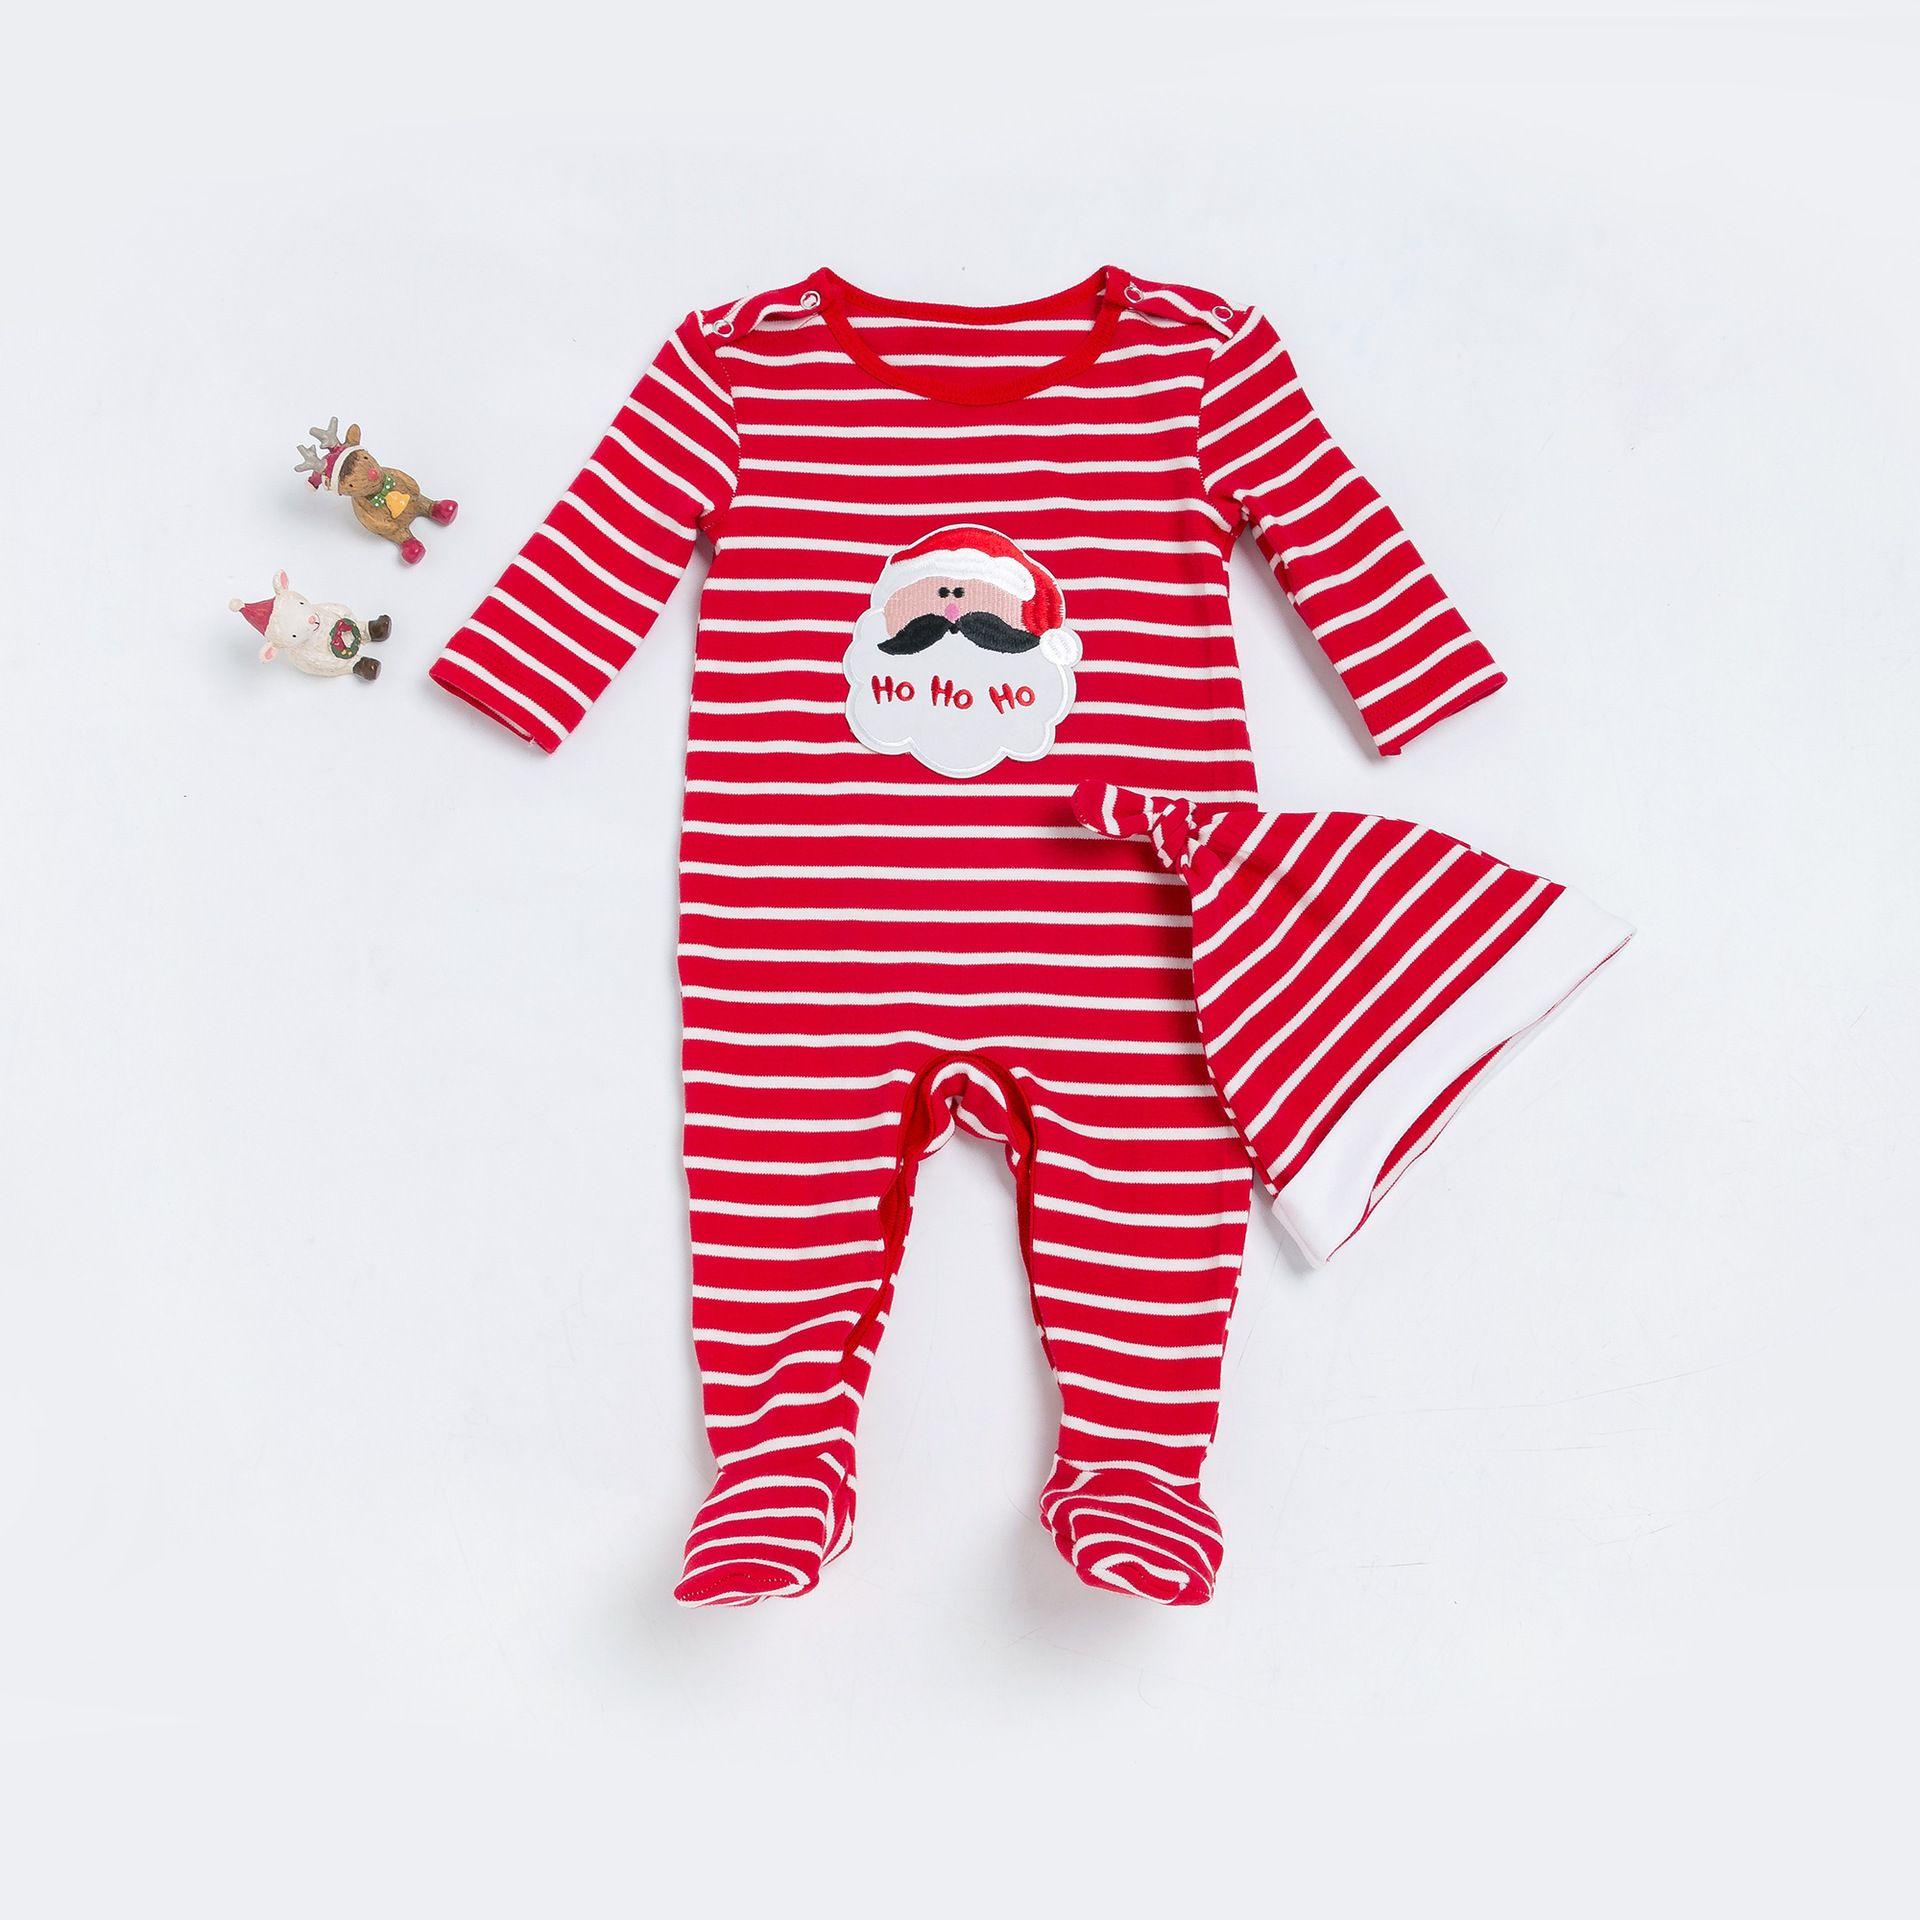 ca1cb149e Christmas Rompers 0-24 Months Baby Cotton Striped Jumpsuit+Hat=2PCS/Set  Newborn Boys Girls Long Sleeve Autumn Winter Cotton Pajamas